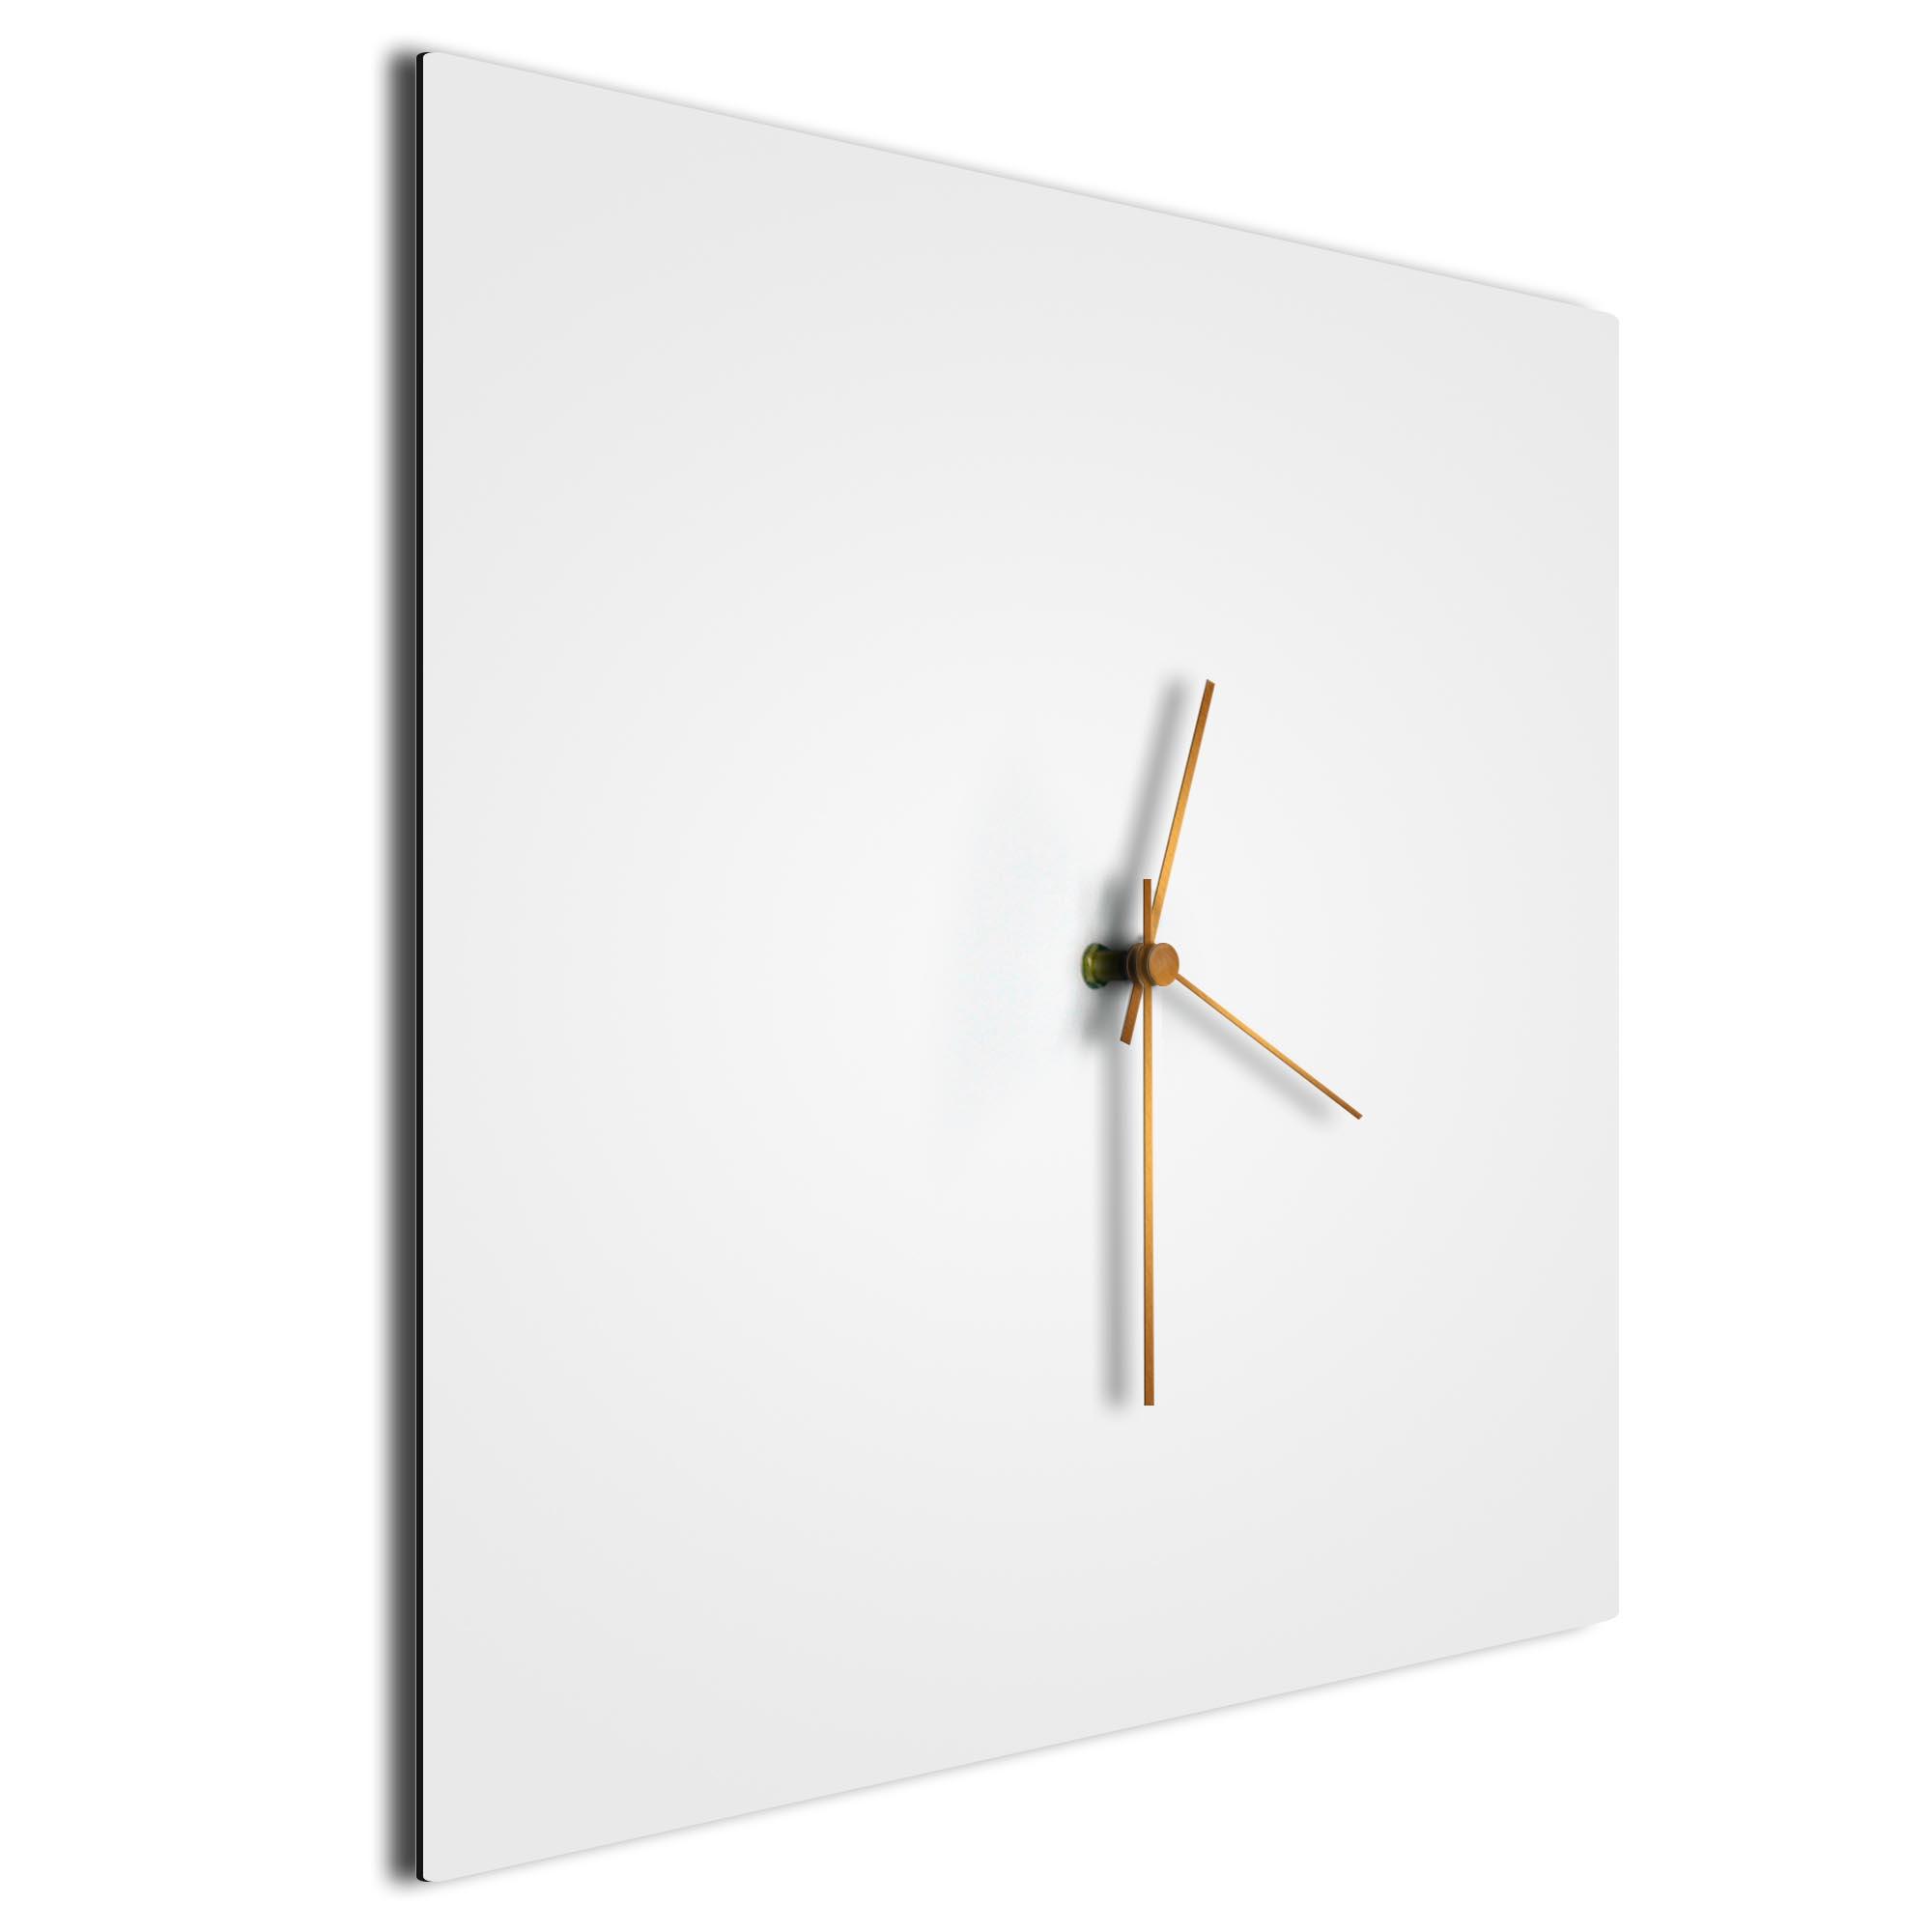 Whiteout Bronze Square Clock - Image 2